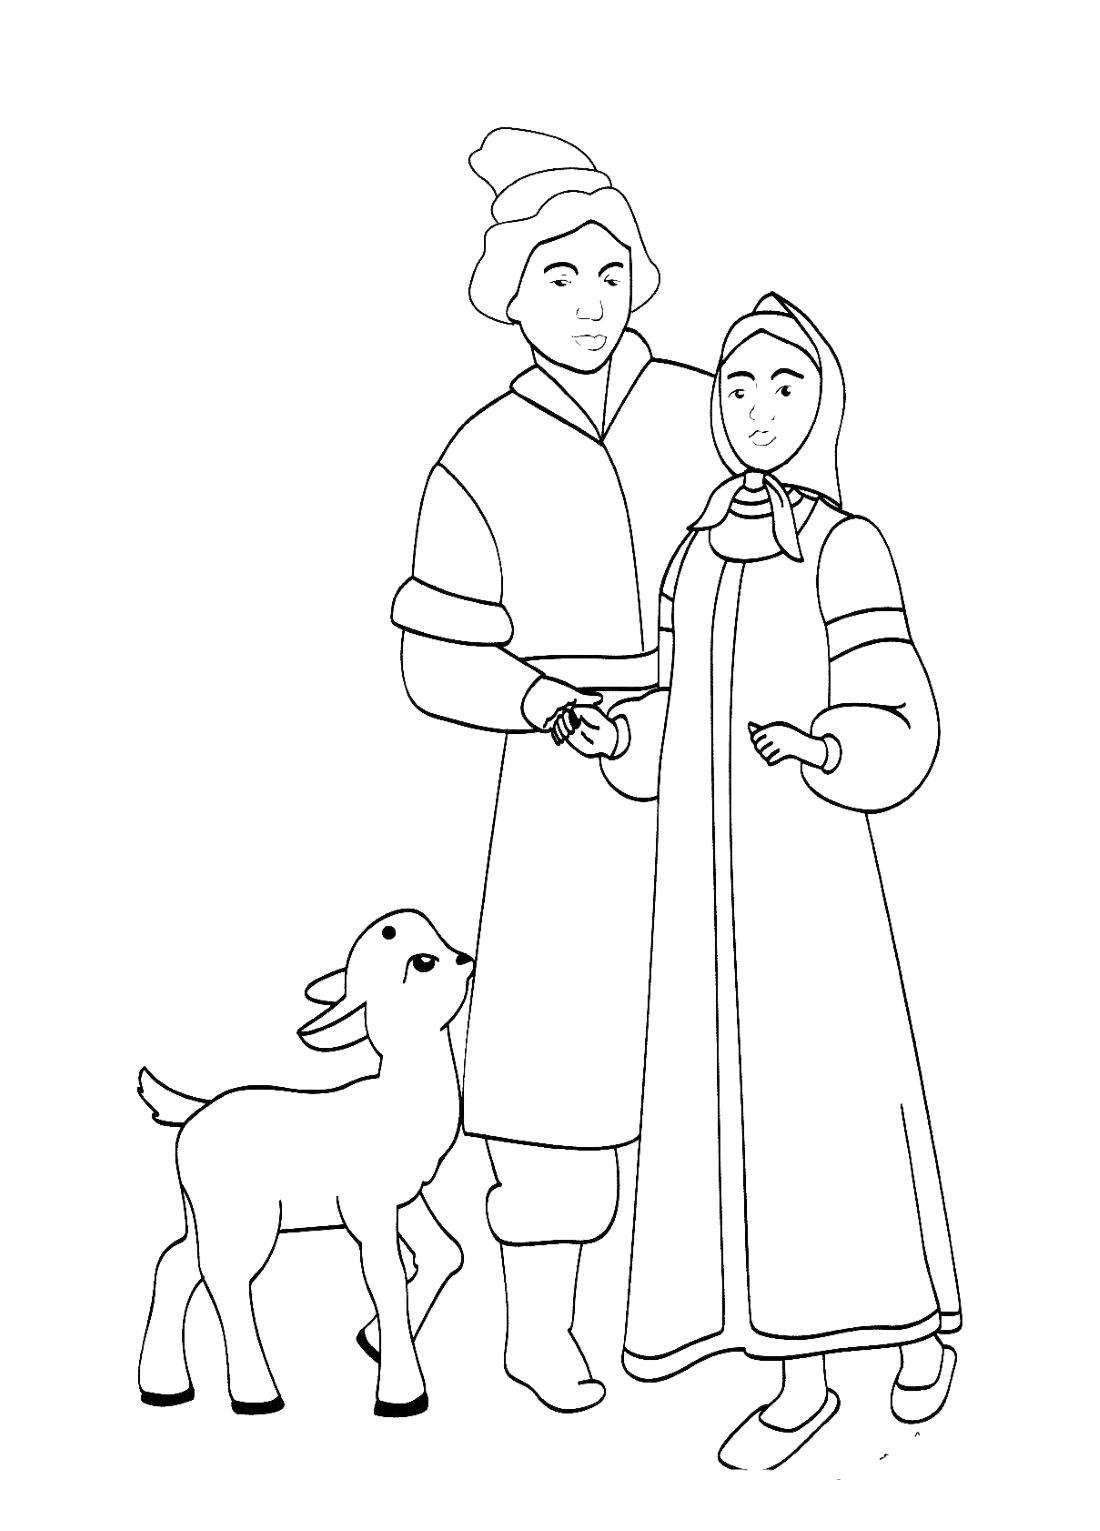 Сестрица аленушка и братец иванушка картинки раскраски